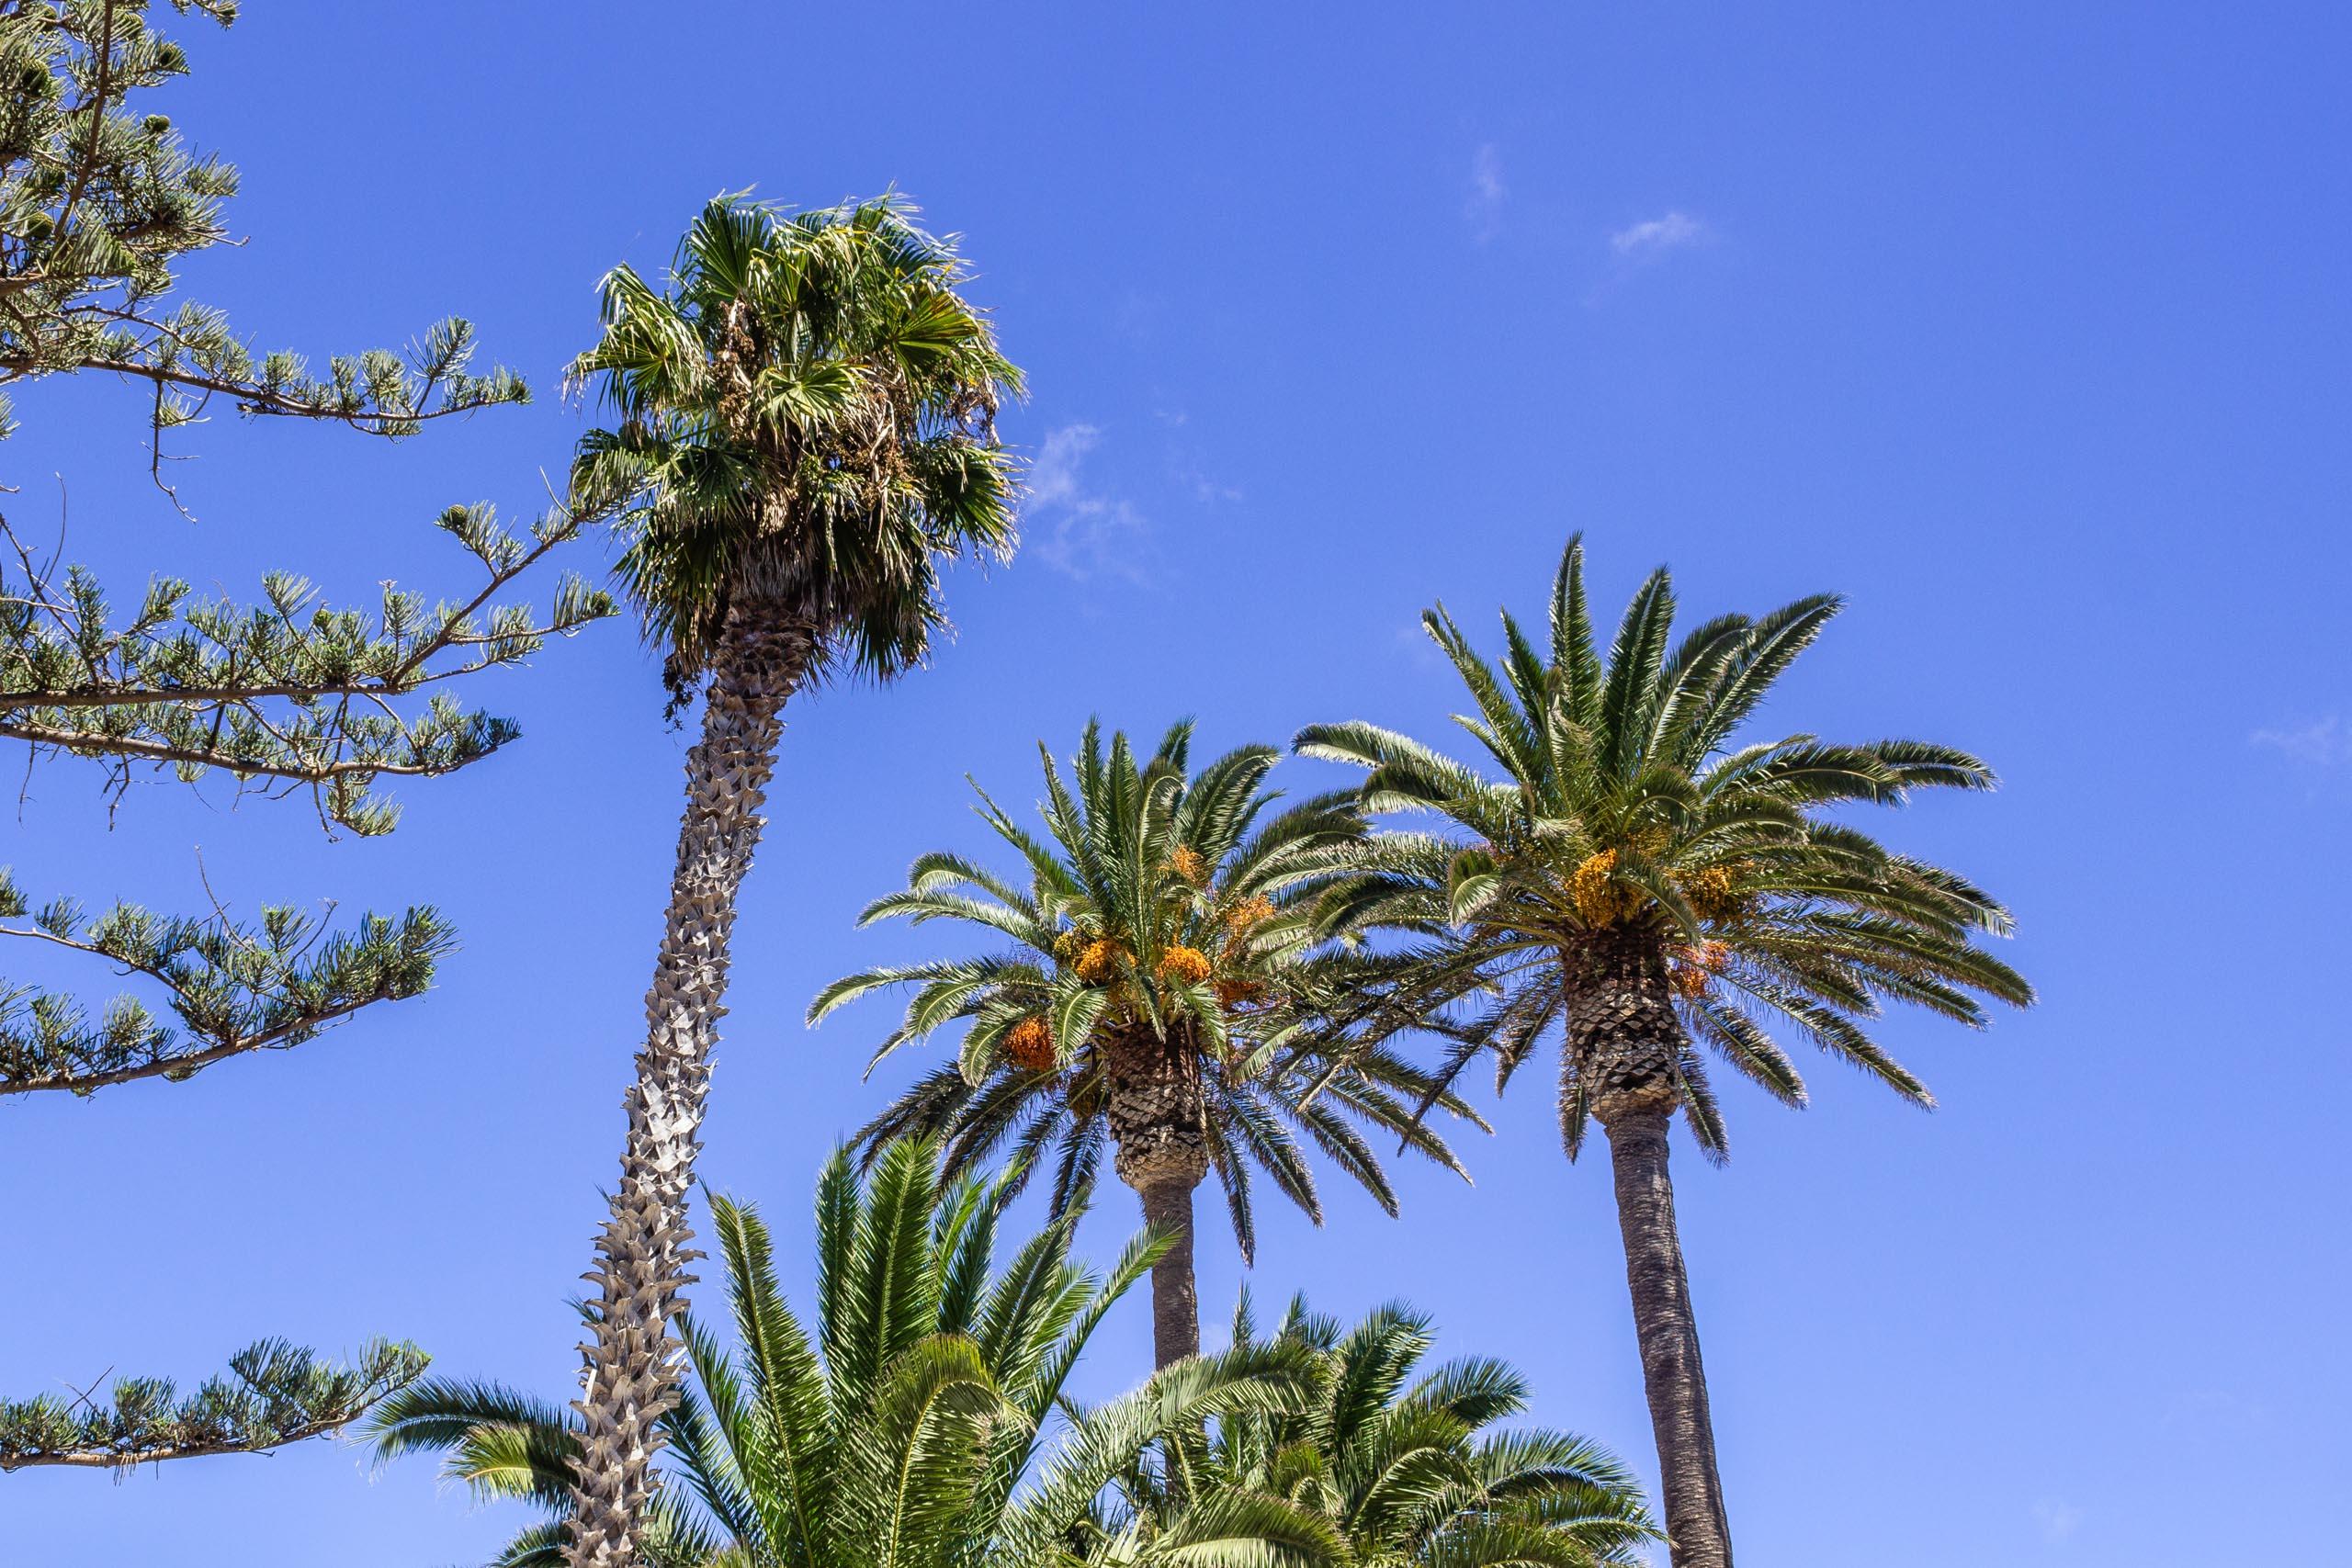 2015 09 Lanzarote PalmTrees 003